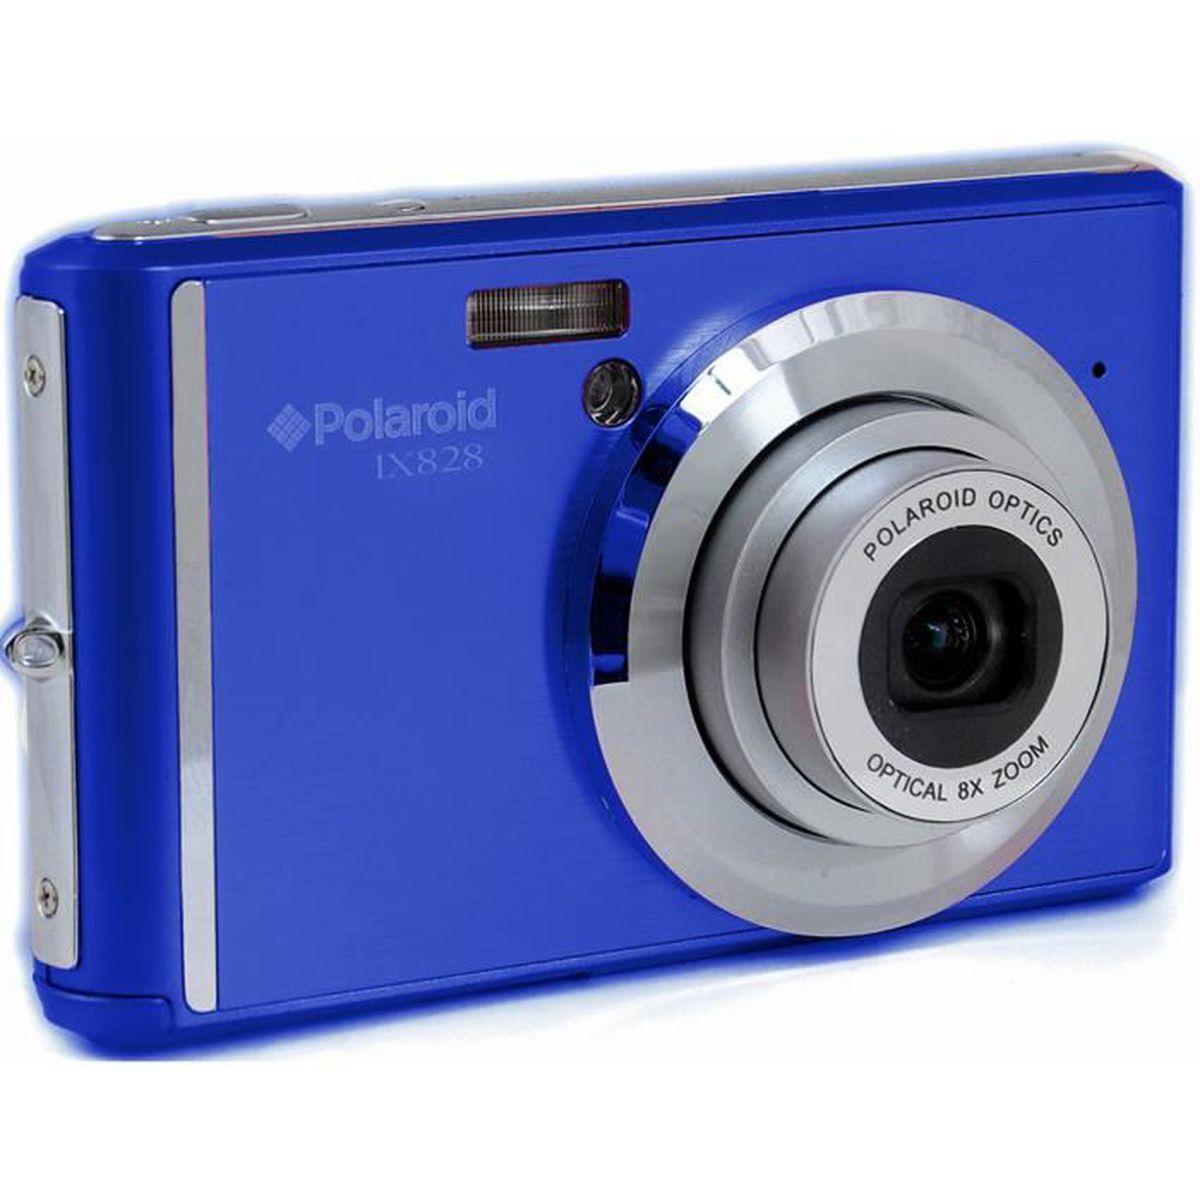 apn 20 mpx polaroid ix828 bleu achat vente appareil photo compact cdiscount. Black Bedroom Furniture Sets. Home Design Ideas